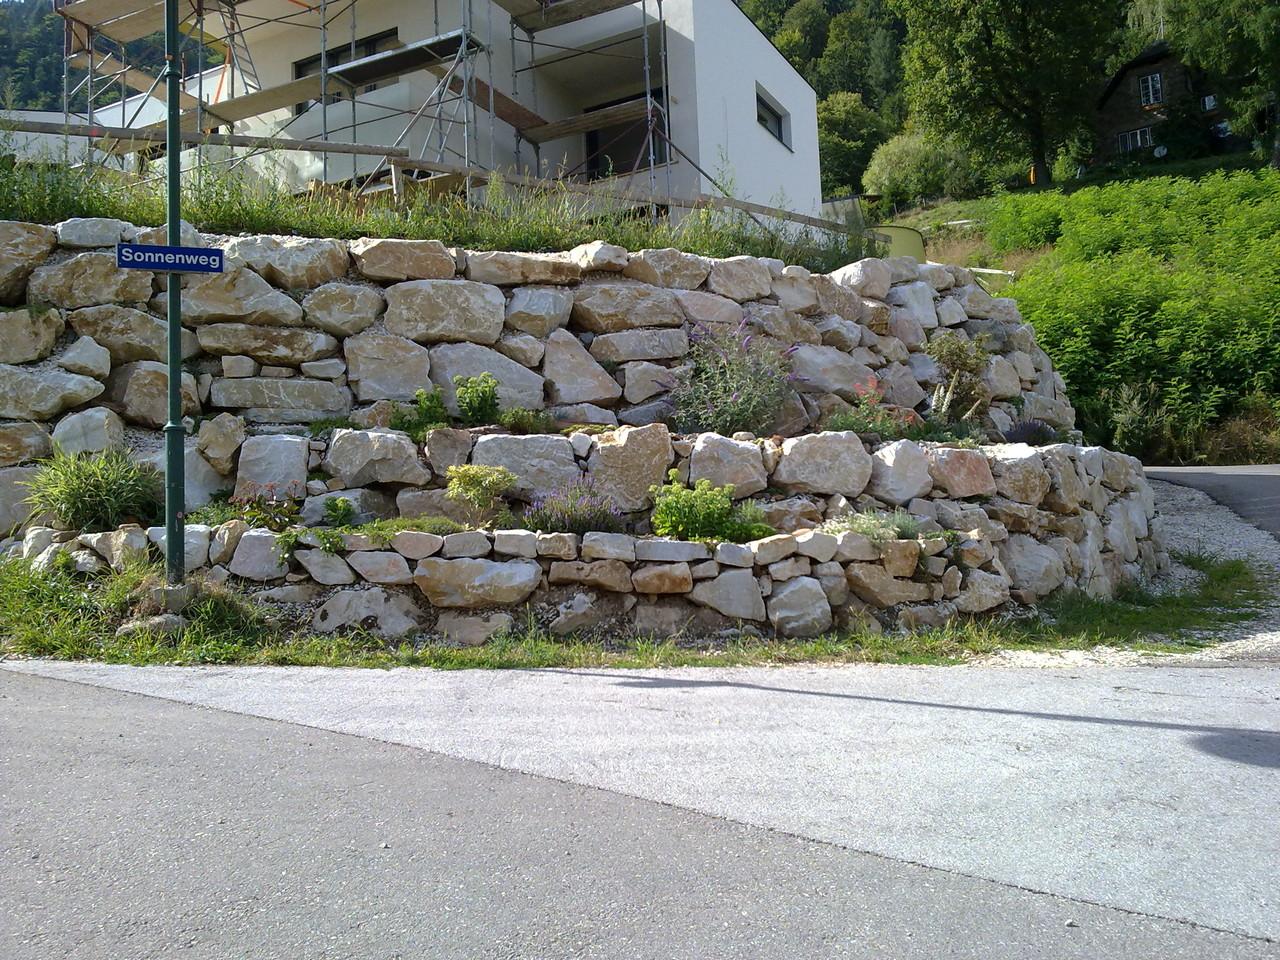 Marmor begrünt / Annenheim Ossiacher See